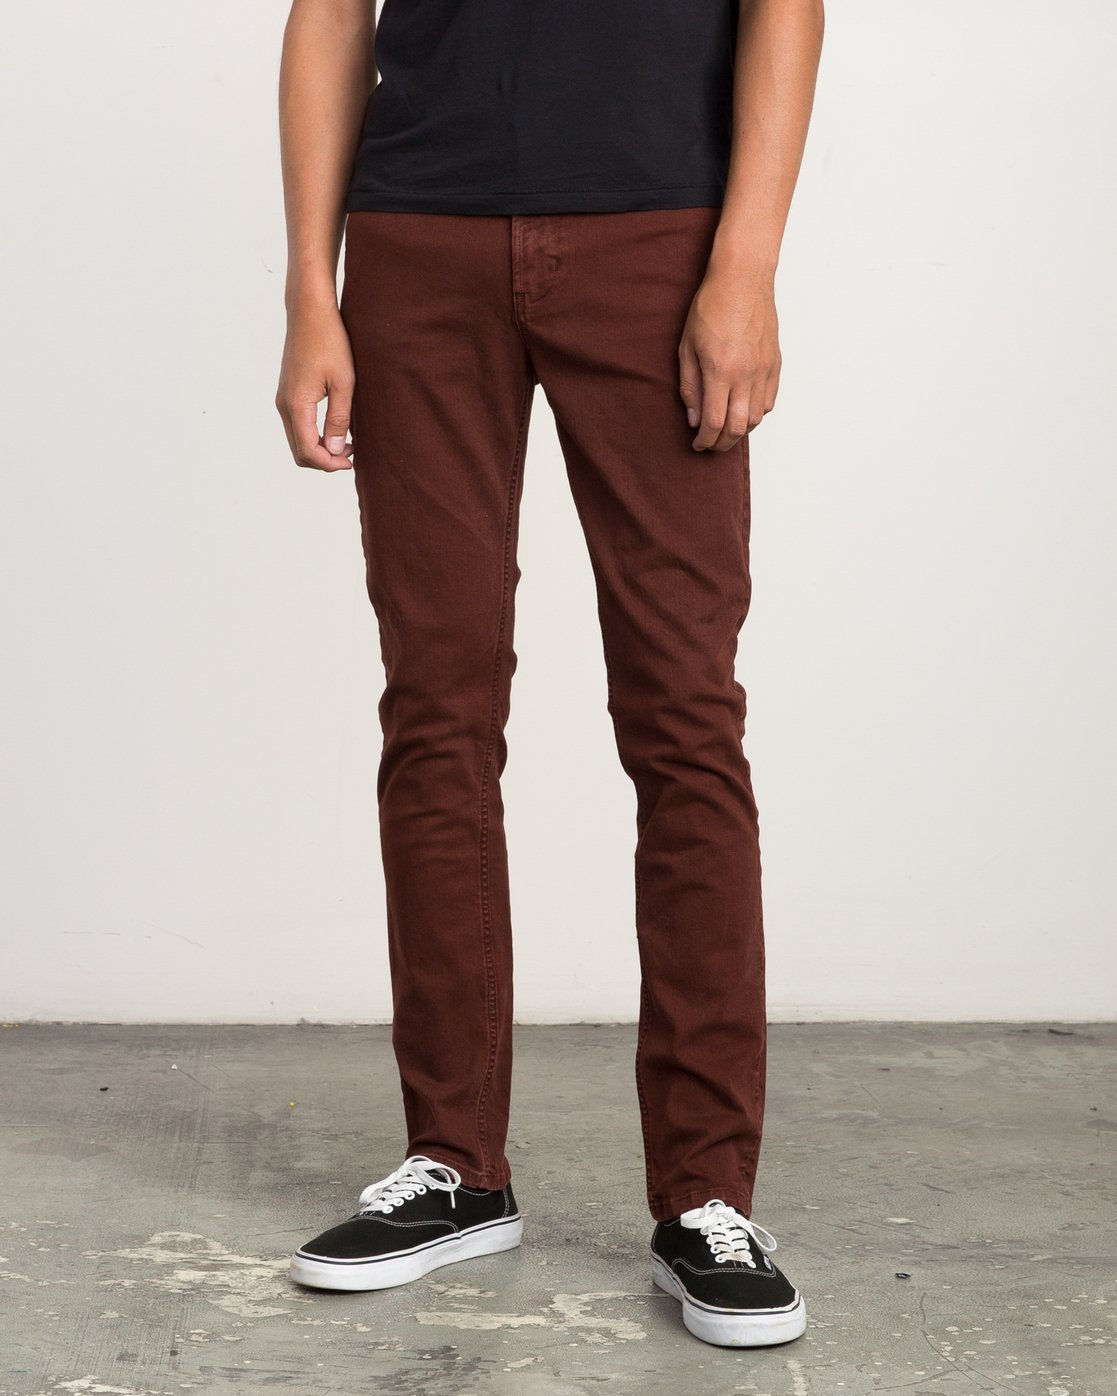 0 Daggers Pigment Slim-Straight Jeans Red M351QRDP RVCA